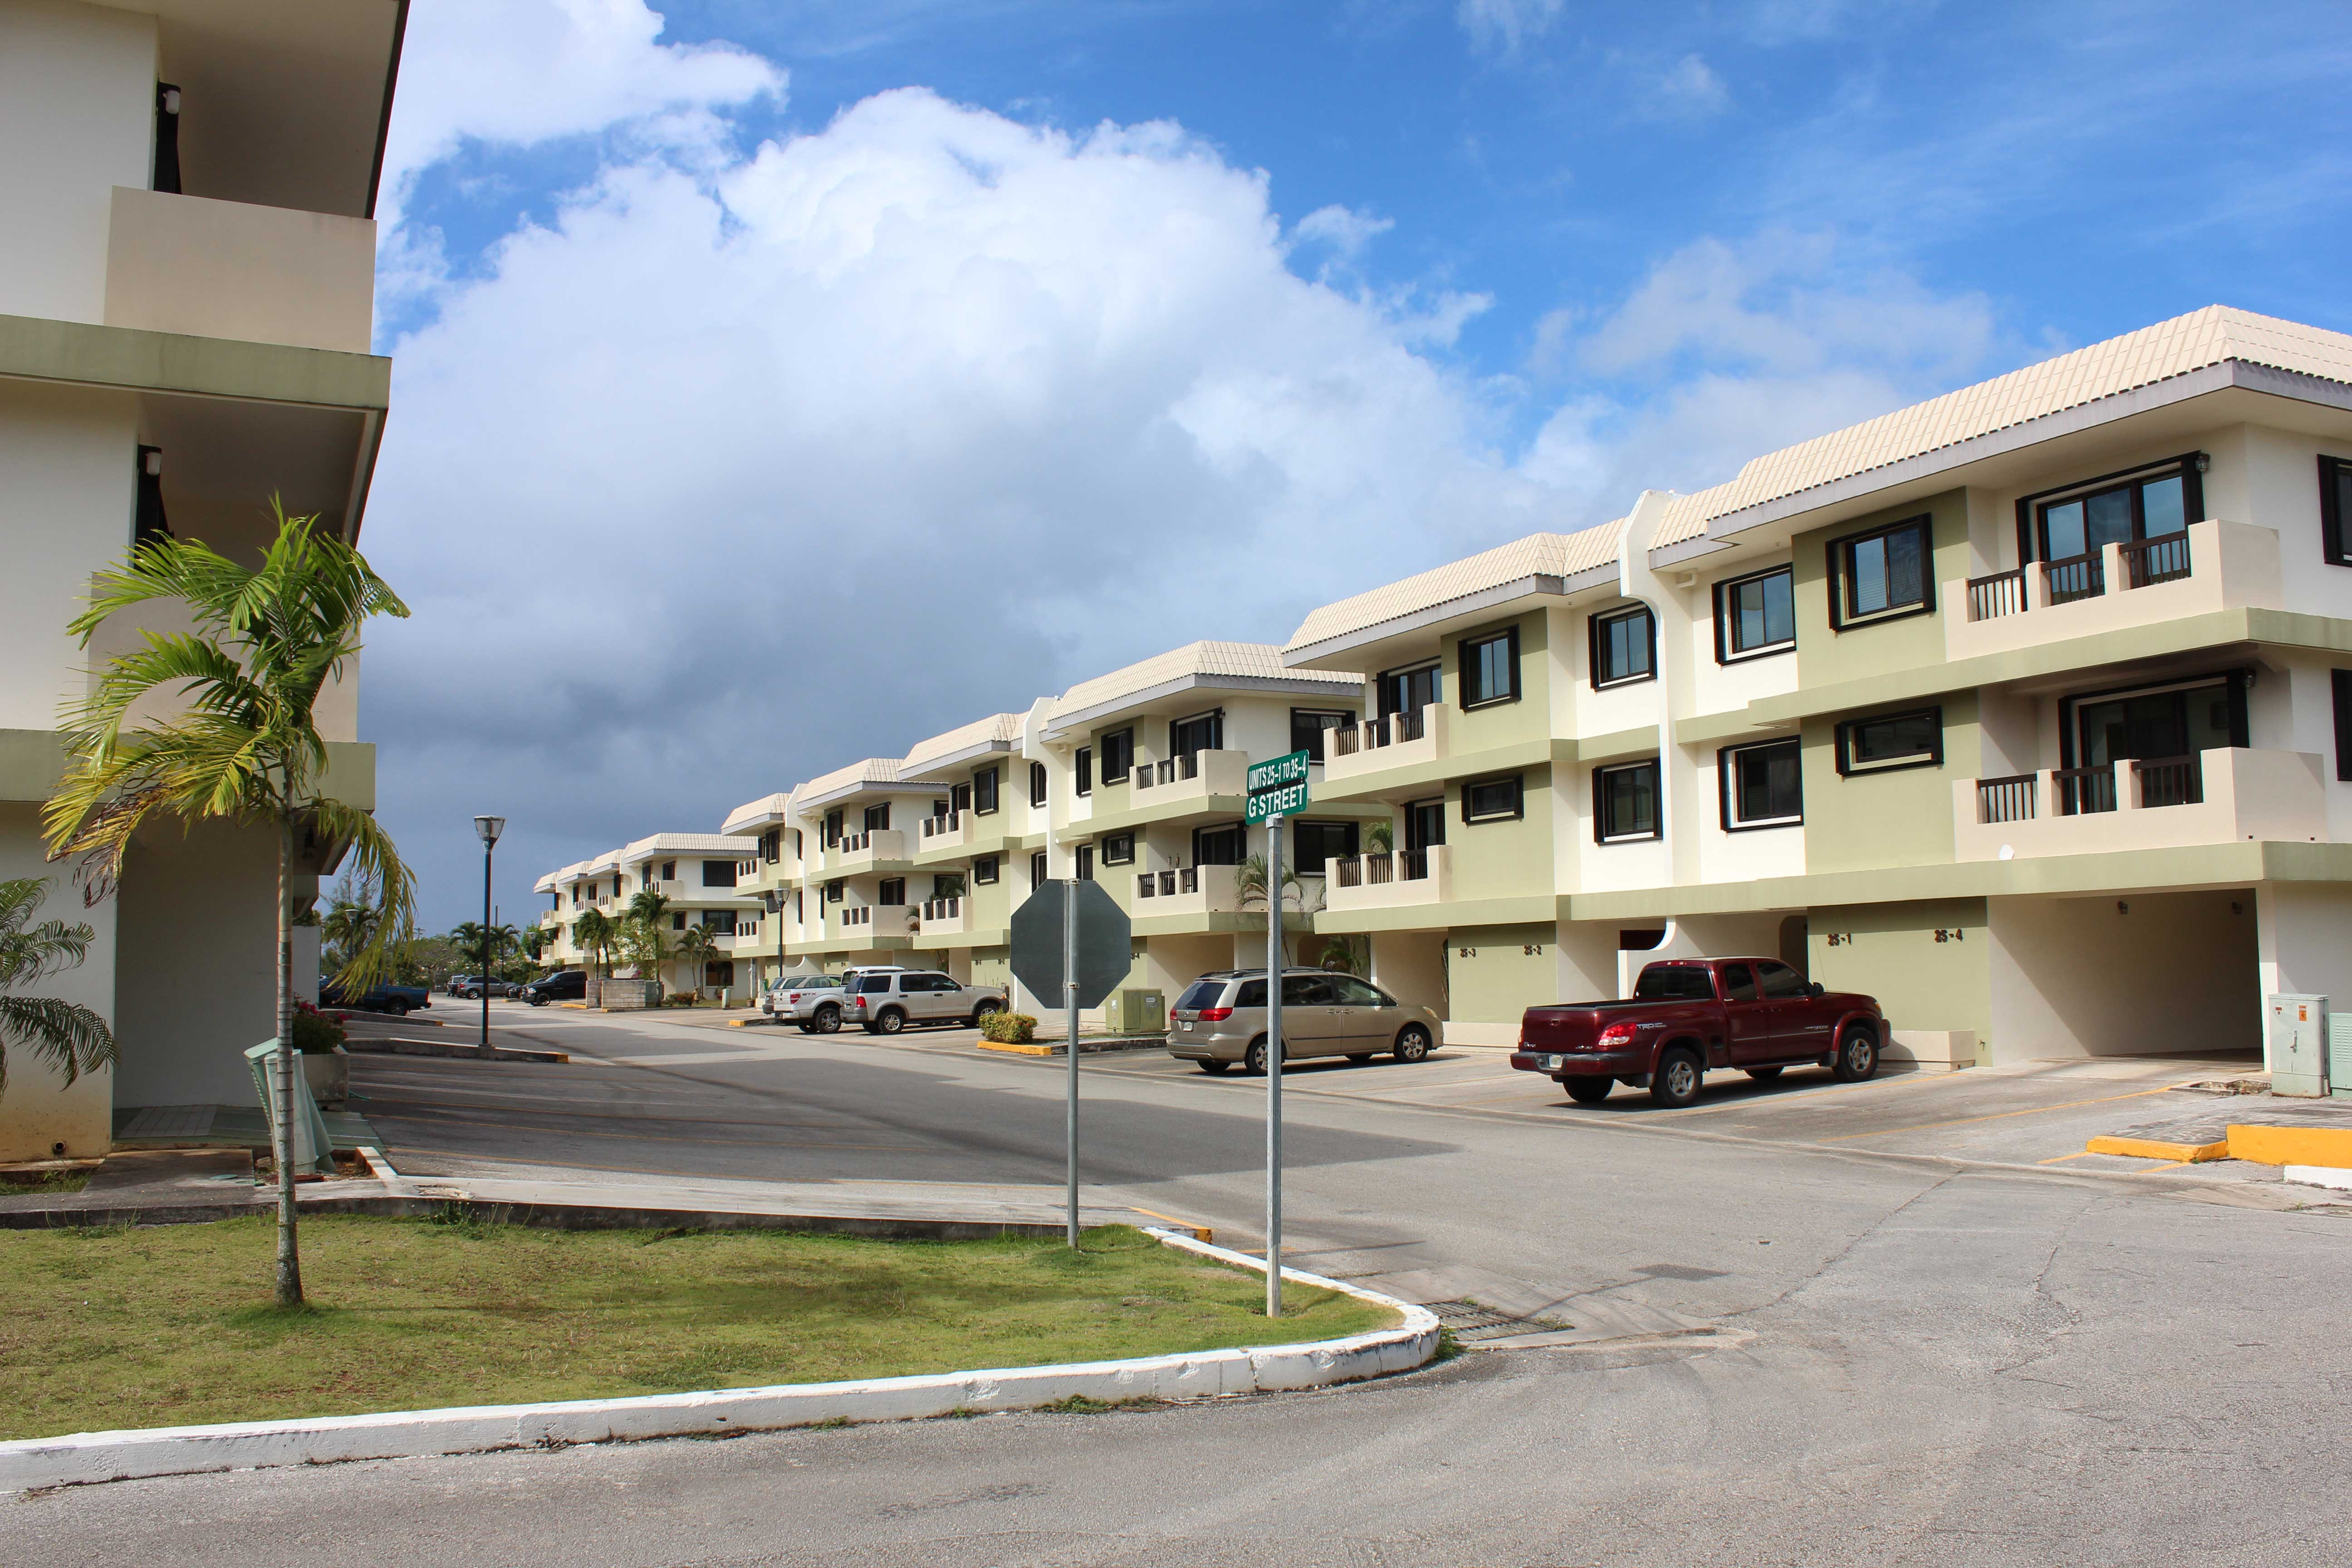 Royal Garden Townhome Guam Neighborhood